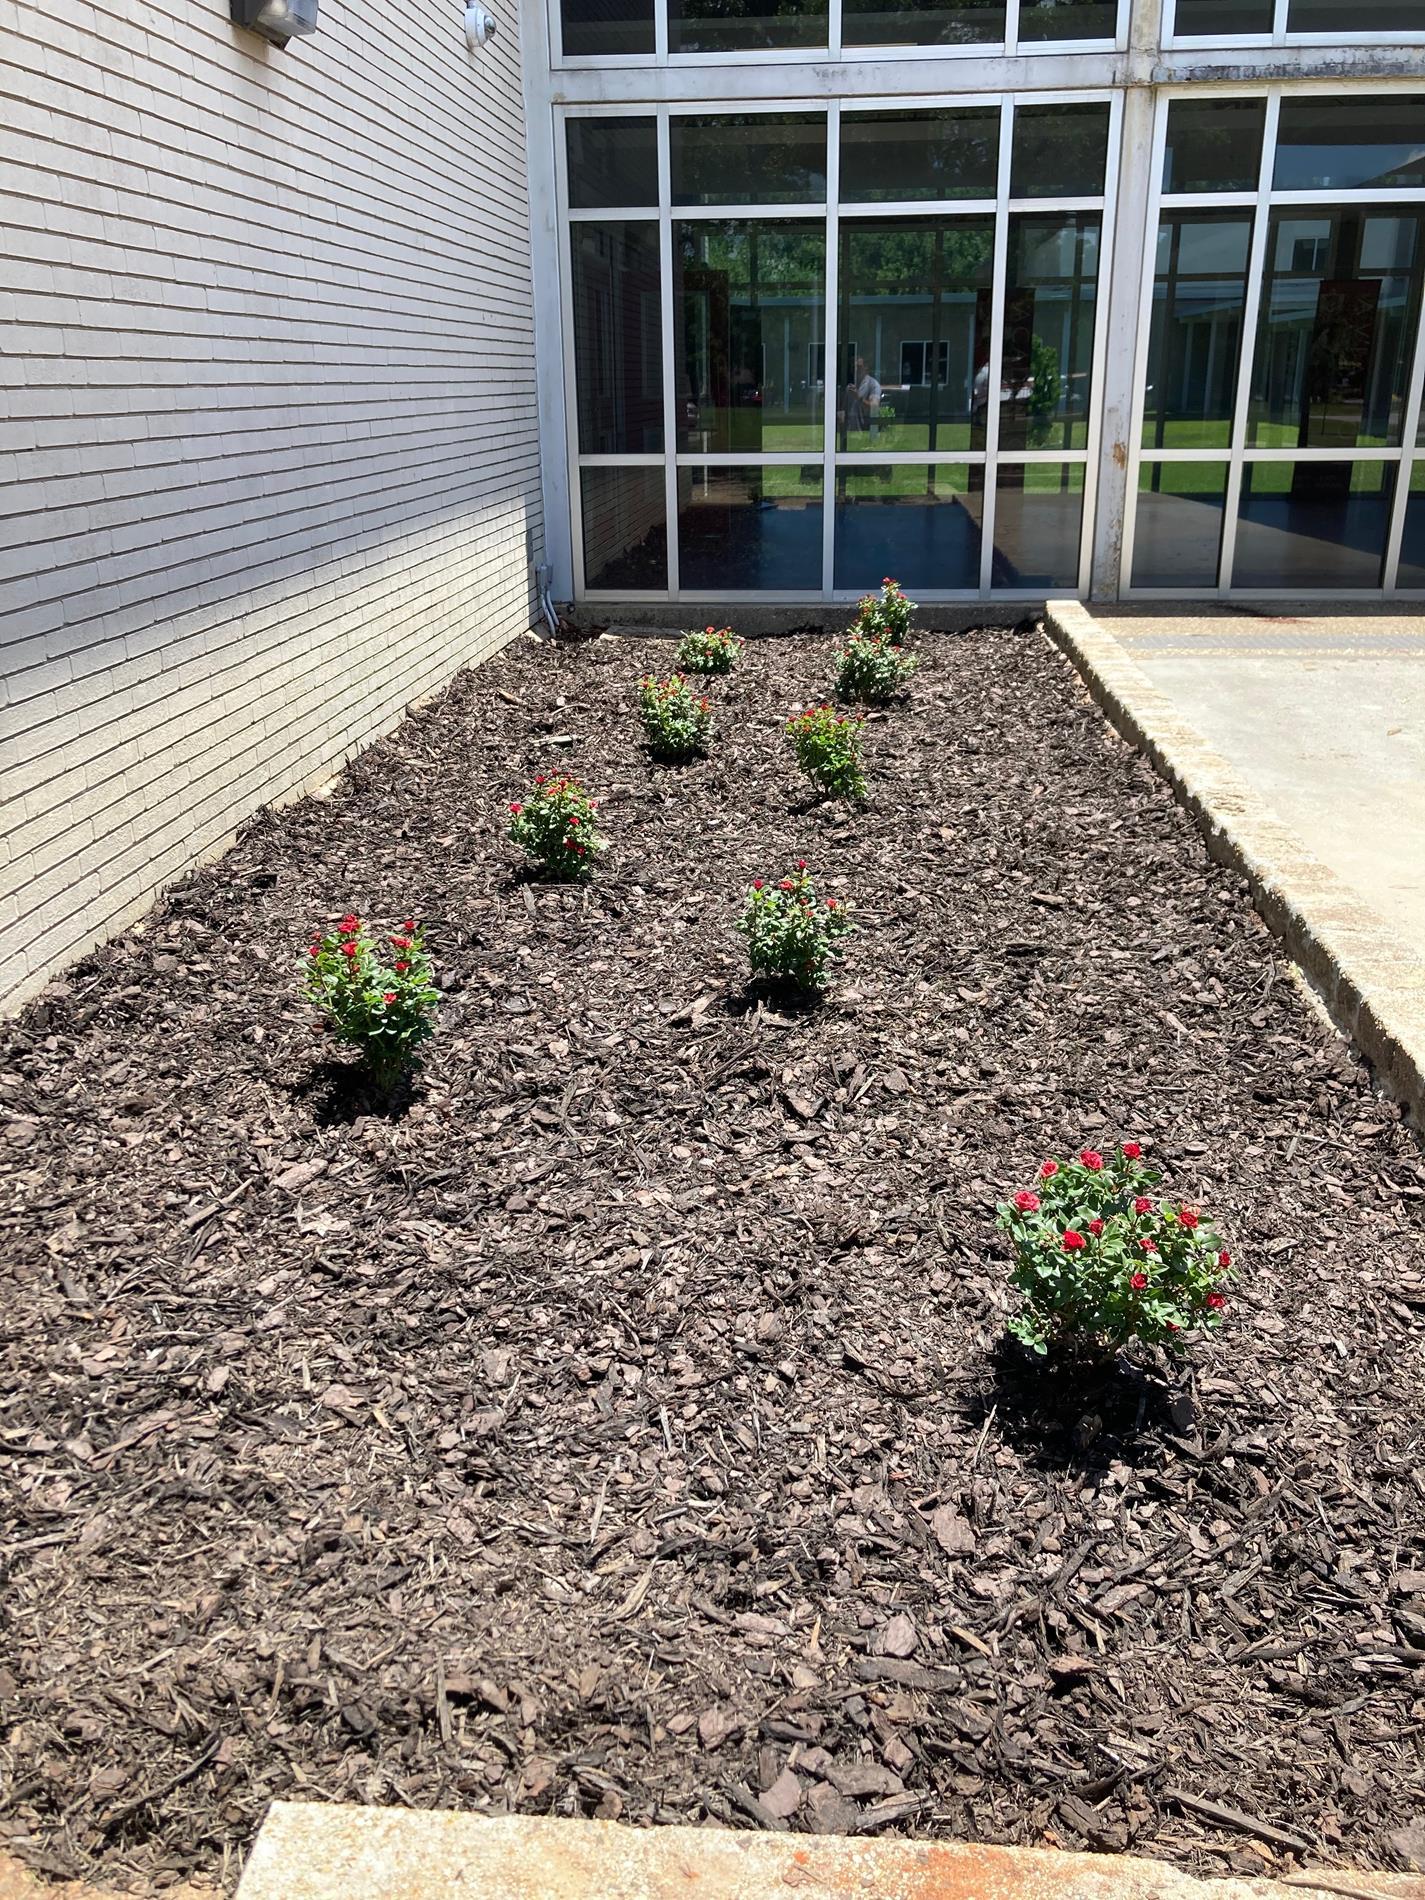 jrotc flower beds